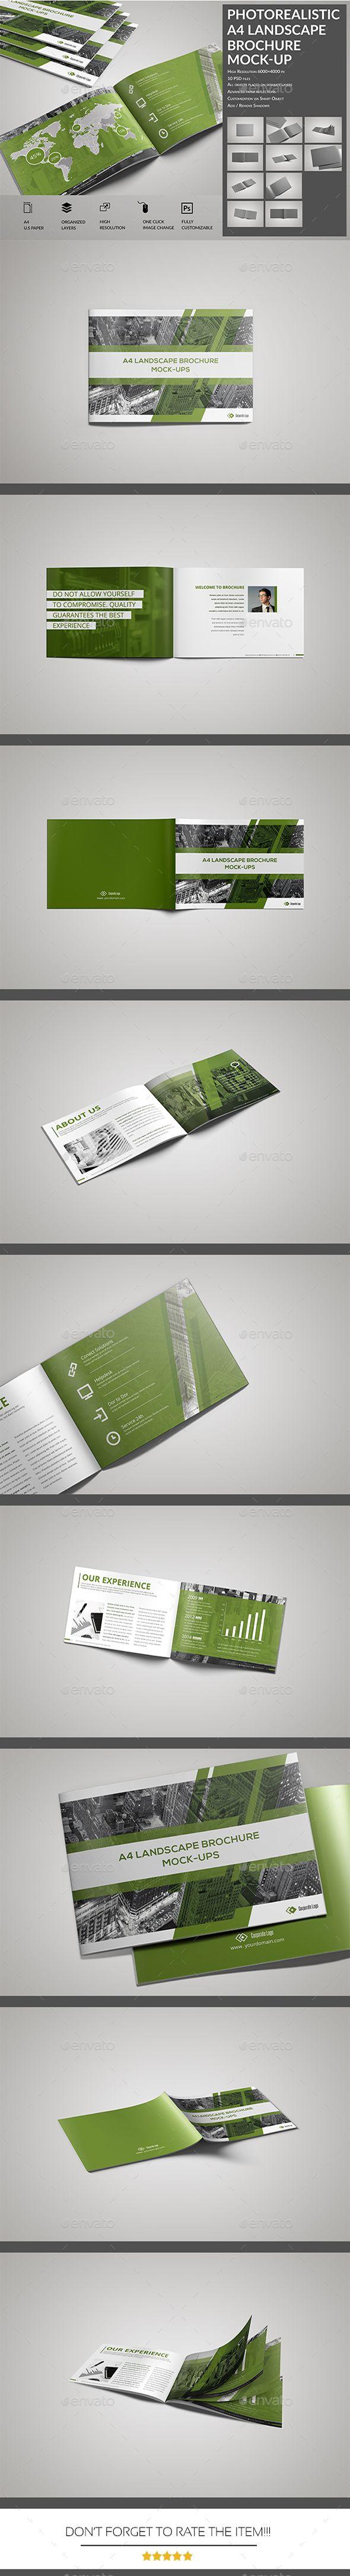 Photorealistic A Landscape Brochure  Catalog MockUp  Mockup